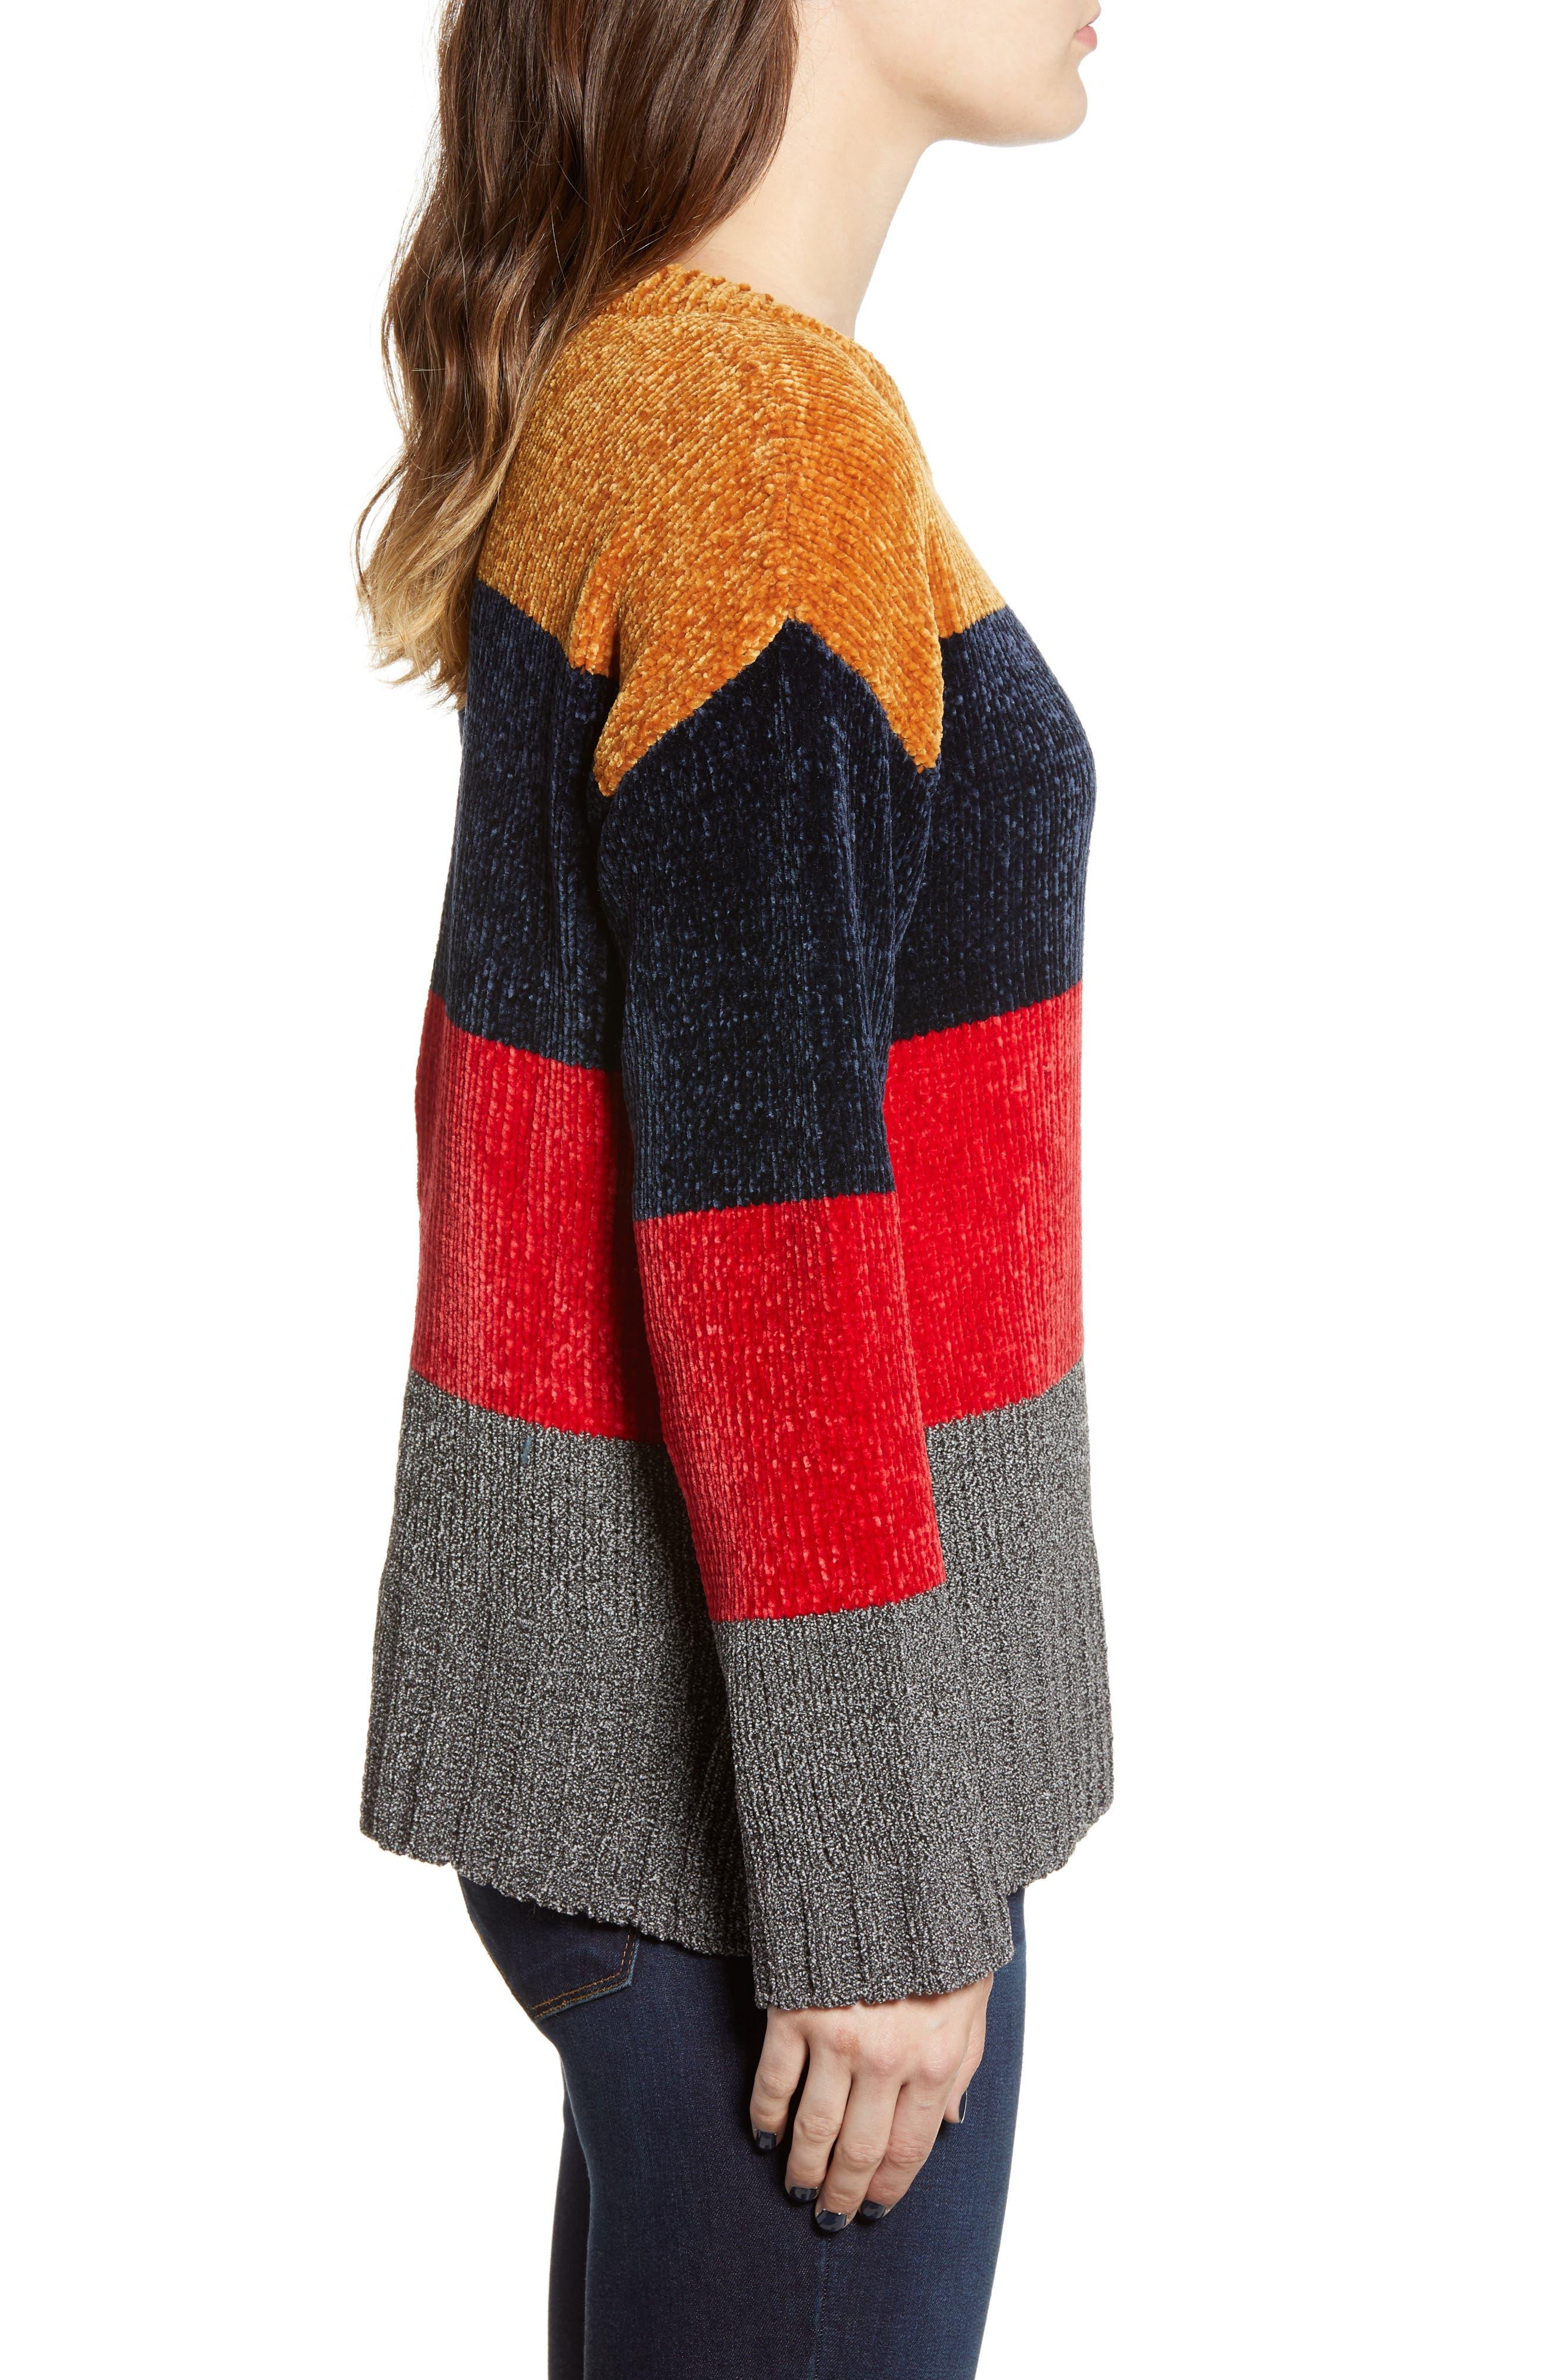 COTTON EMPORIUM,                             Stripe Chenille Sweater,                             Alternate thumbnail 3, color,                             710